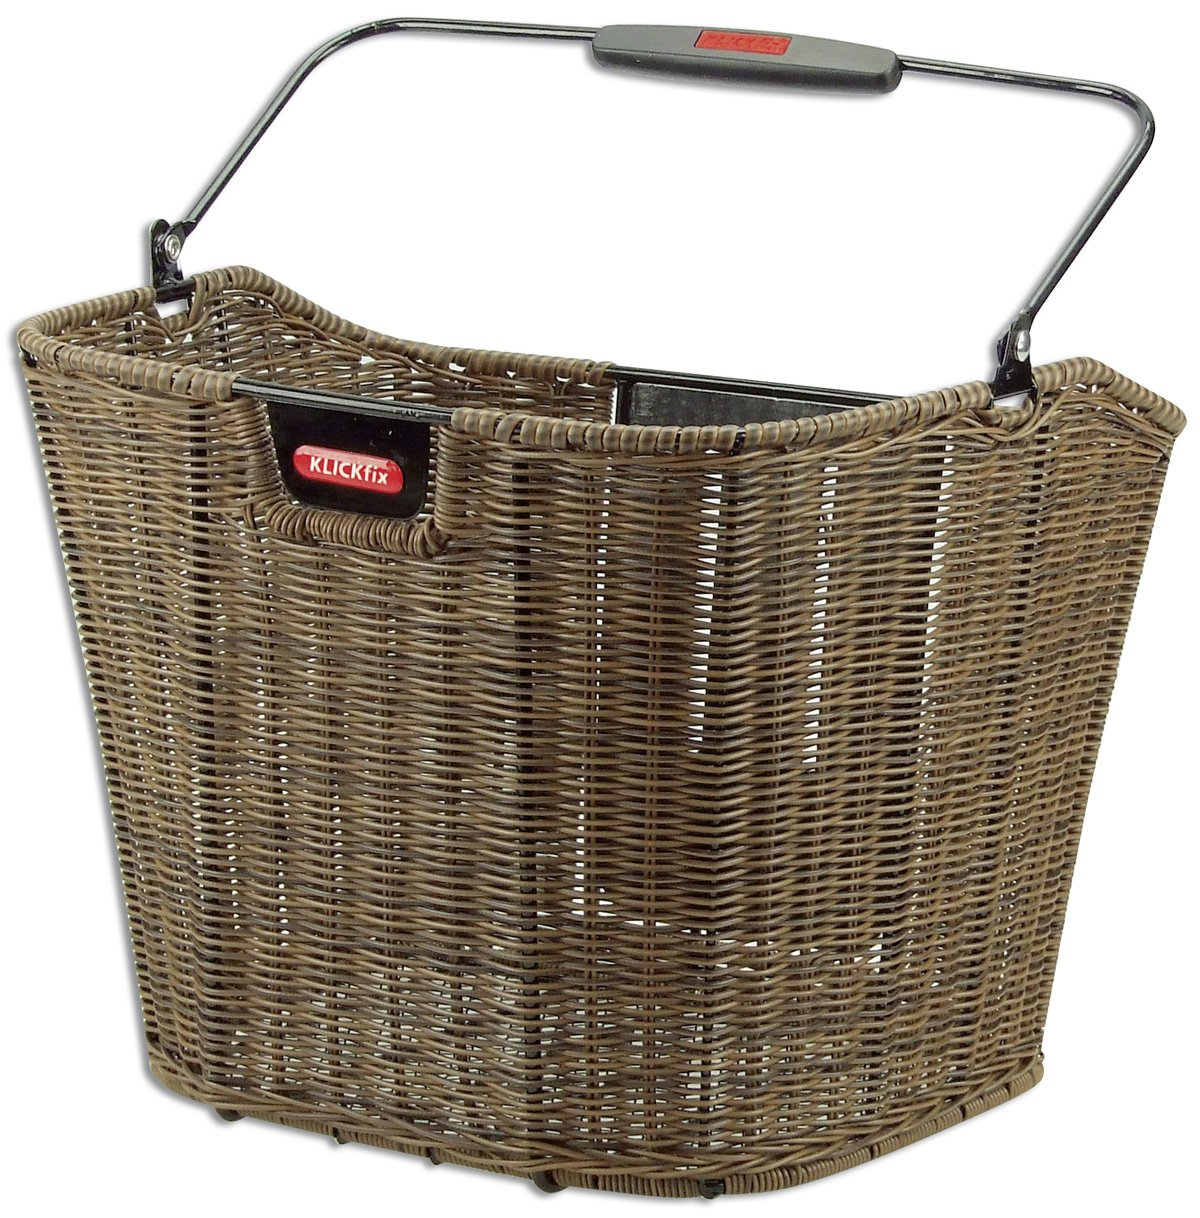 KlickFix Front Handlebar Basket Rixen & Kaul Structura EF basket brown